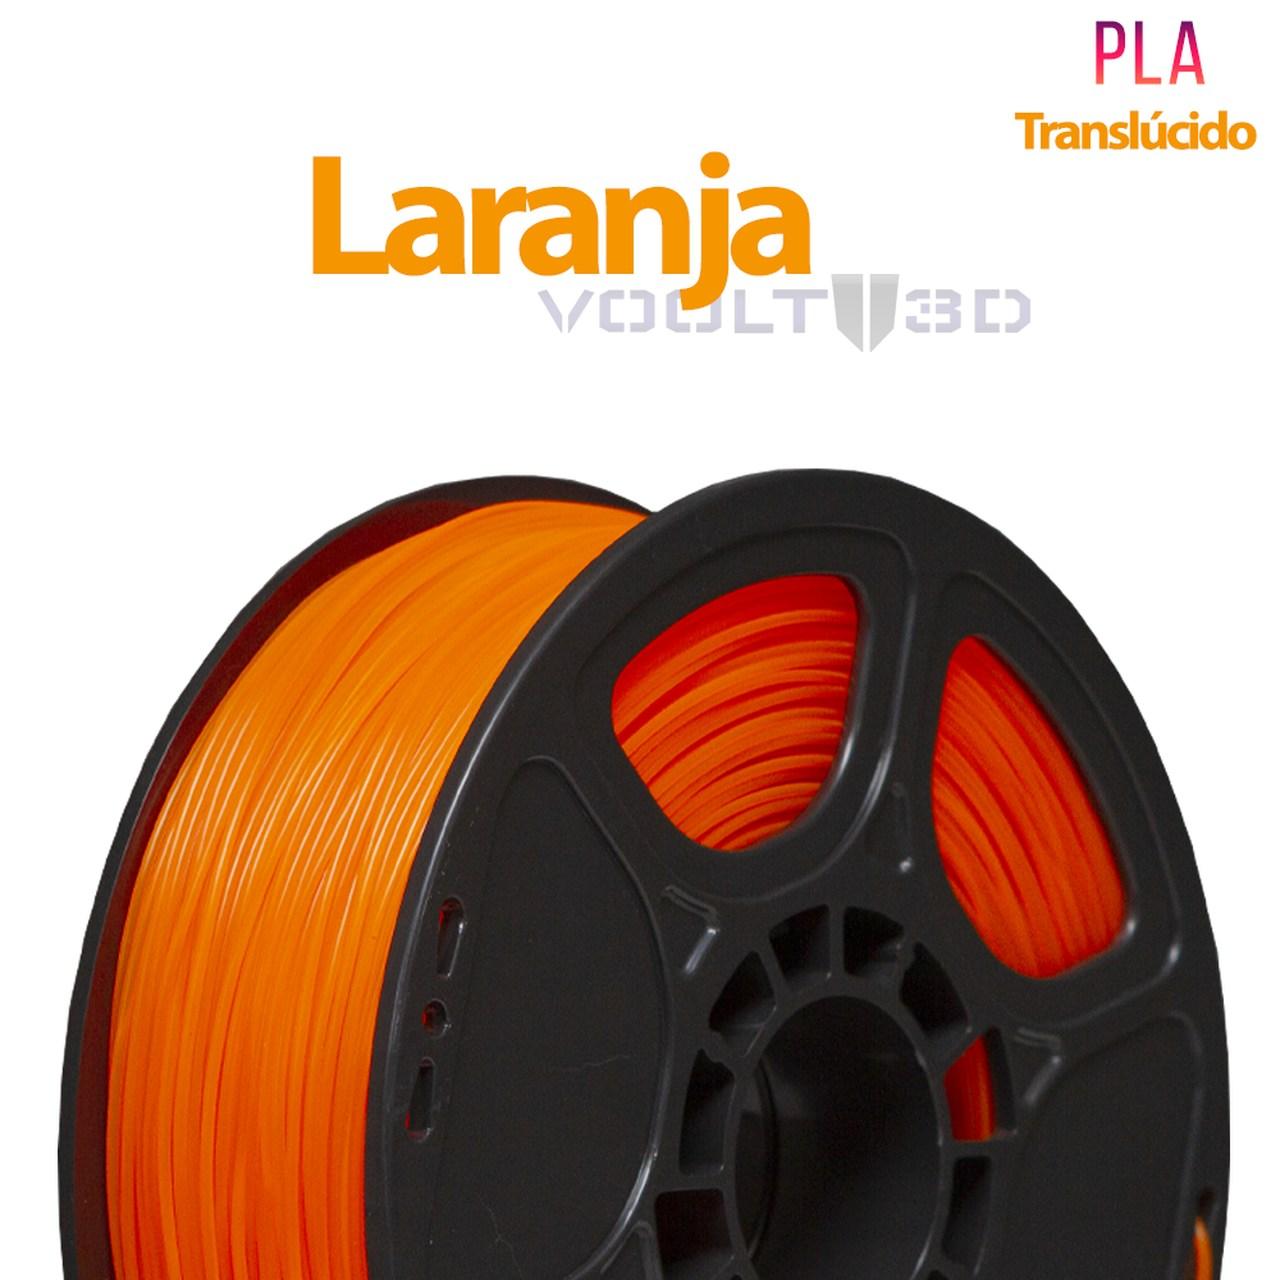 Filamento PLA - Laranja Translúcido - Voolt - 1.75mm - 1kg